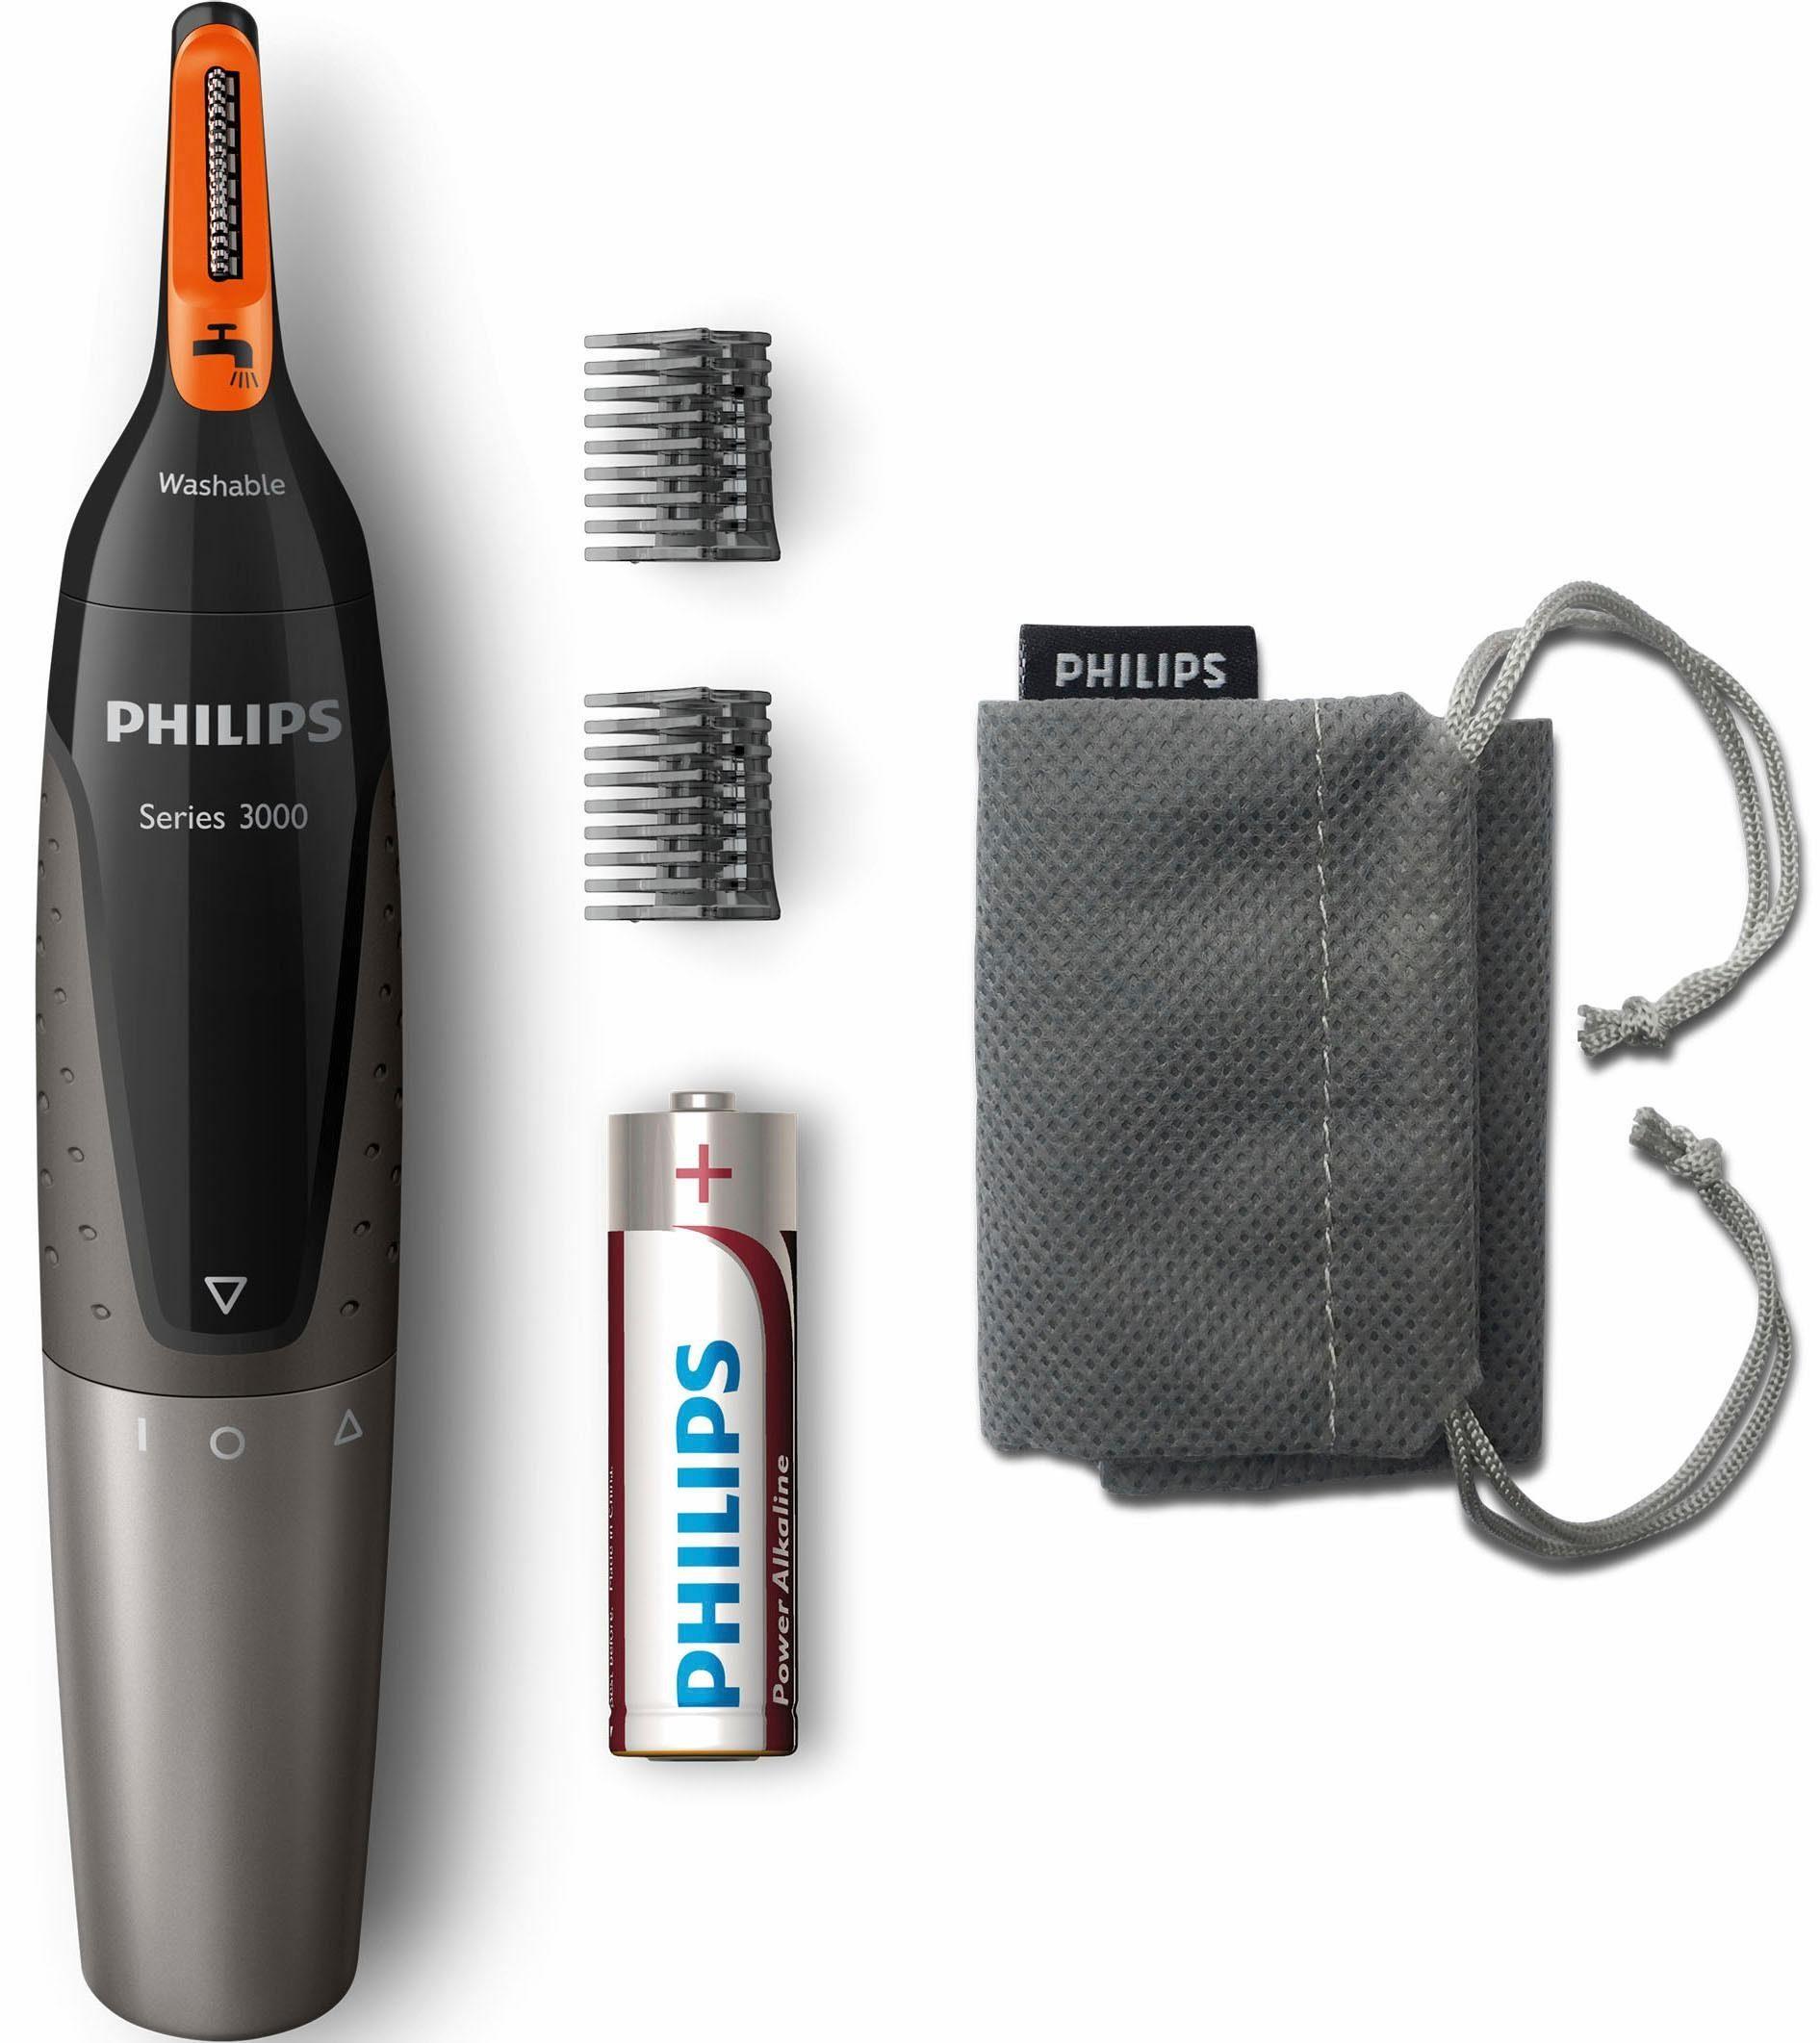 Philips Series 3000 Nasen-und Ohrenhaartrimmer NT3160/10, ProtecTube-Technologie